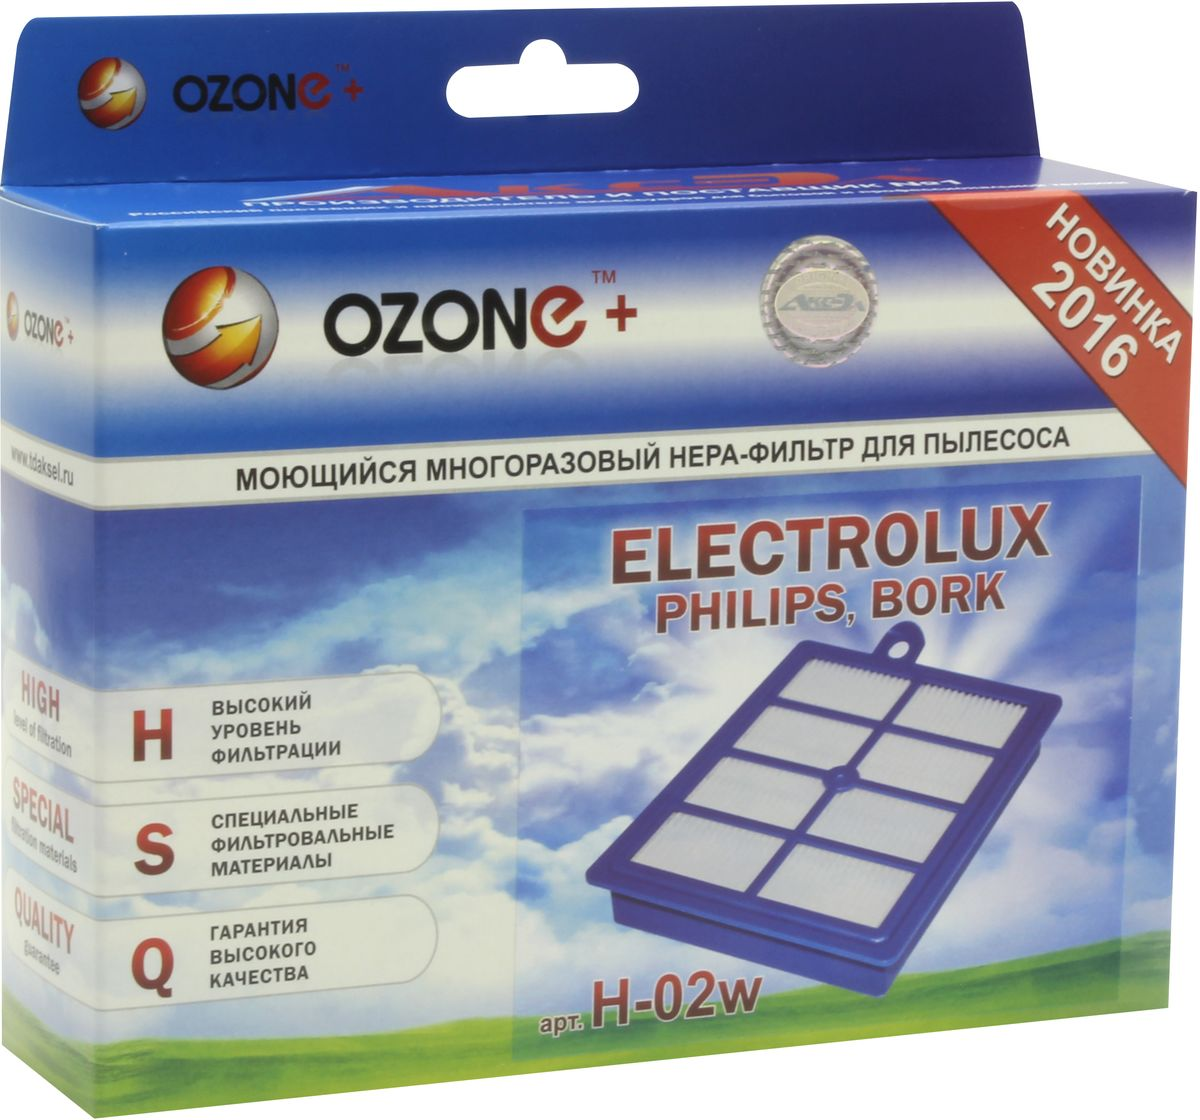 все цены на Ozone H-02W HEPA фильтр для пылесоса онлайн